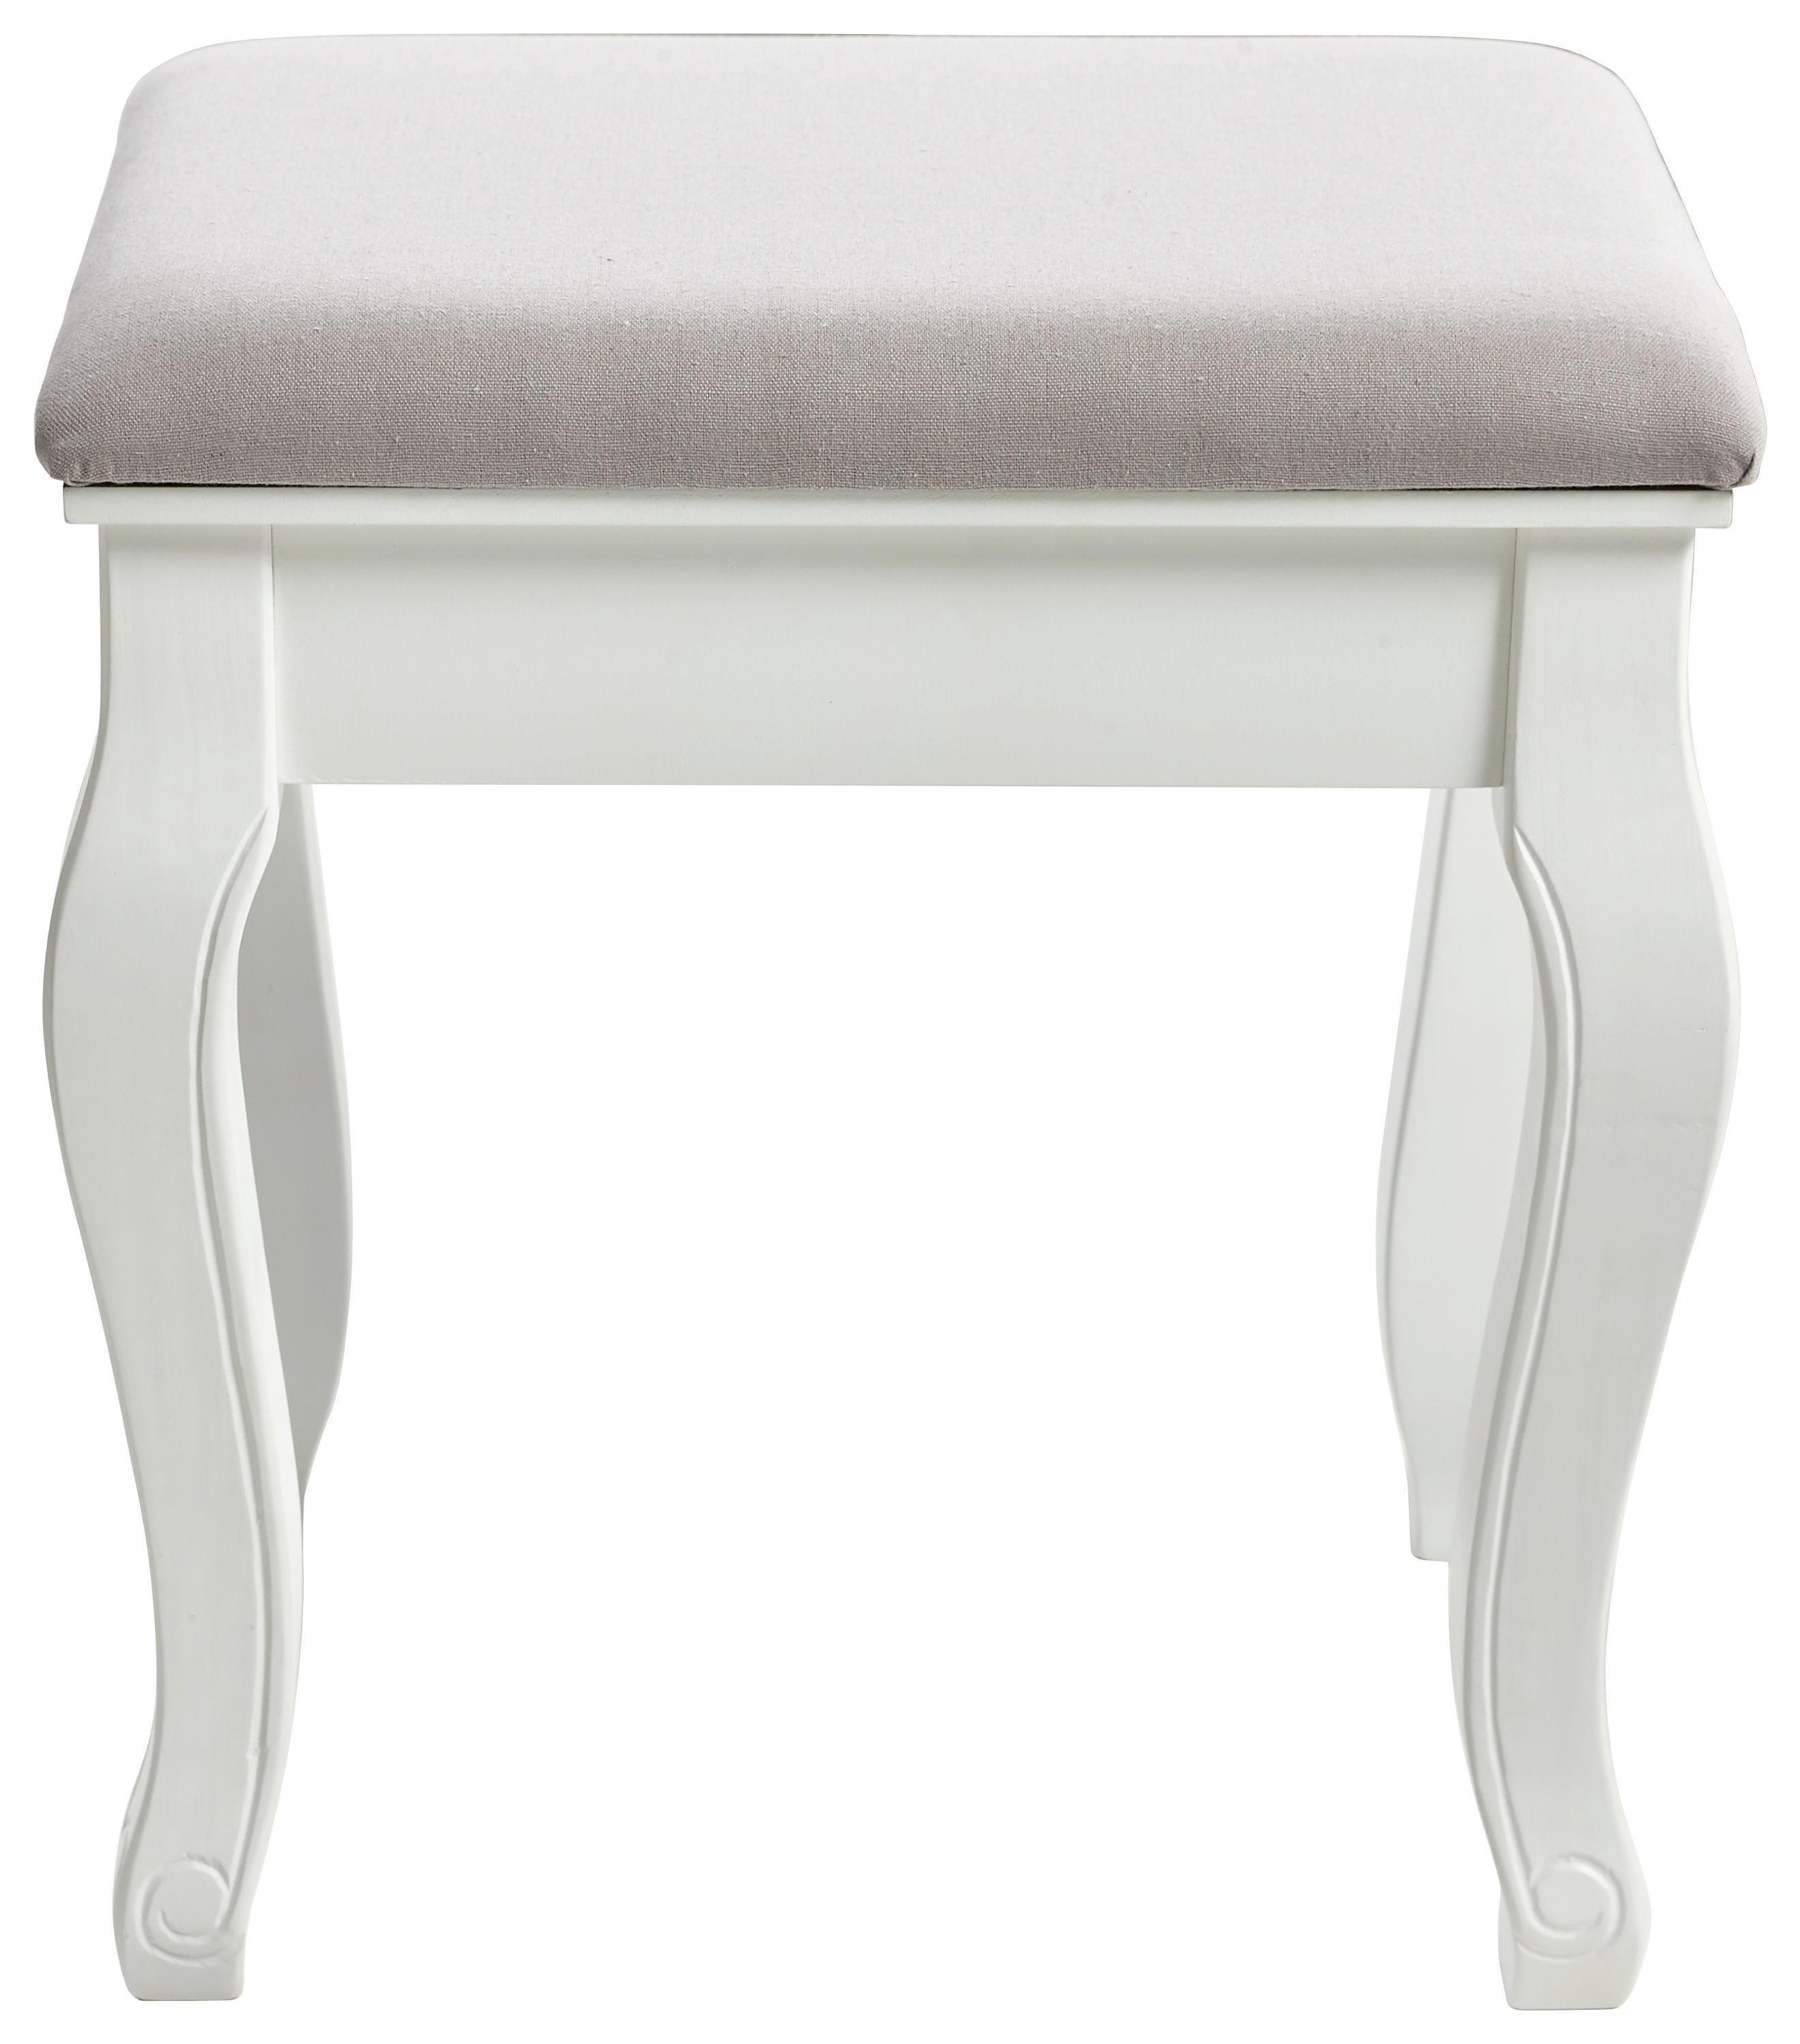 HOCKER Kiefer massiv Grau, Weiß - Weiß/Grau, LIFESTYLE, Holz/Textil (40/45/30cm) - CARRYHOME